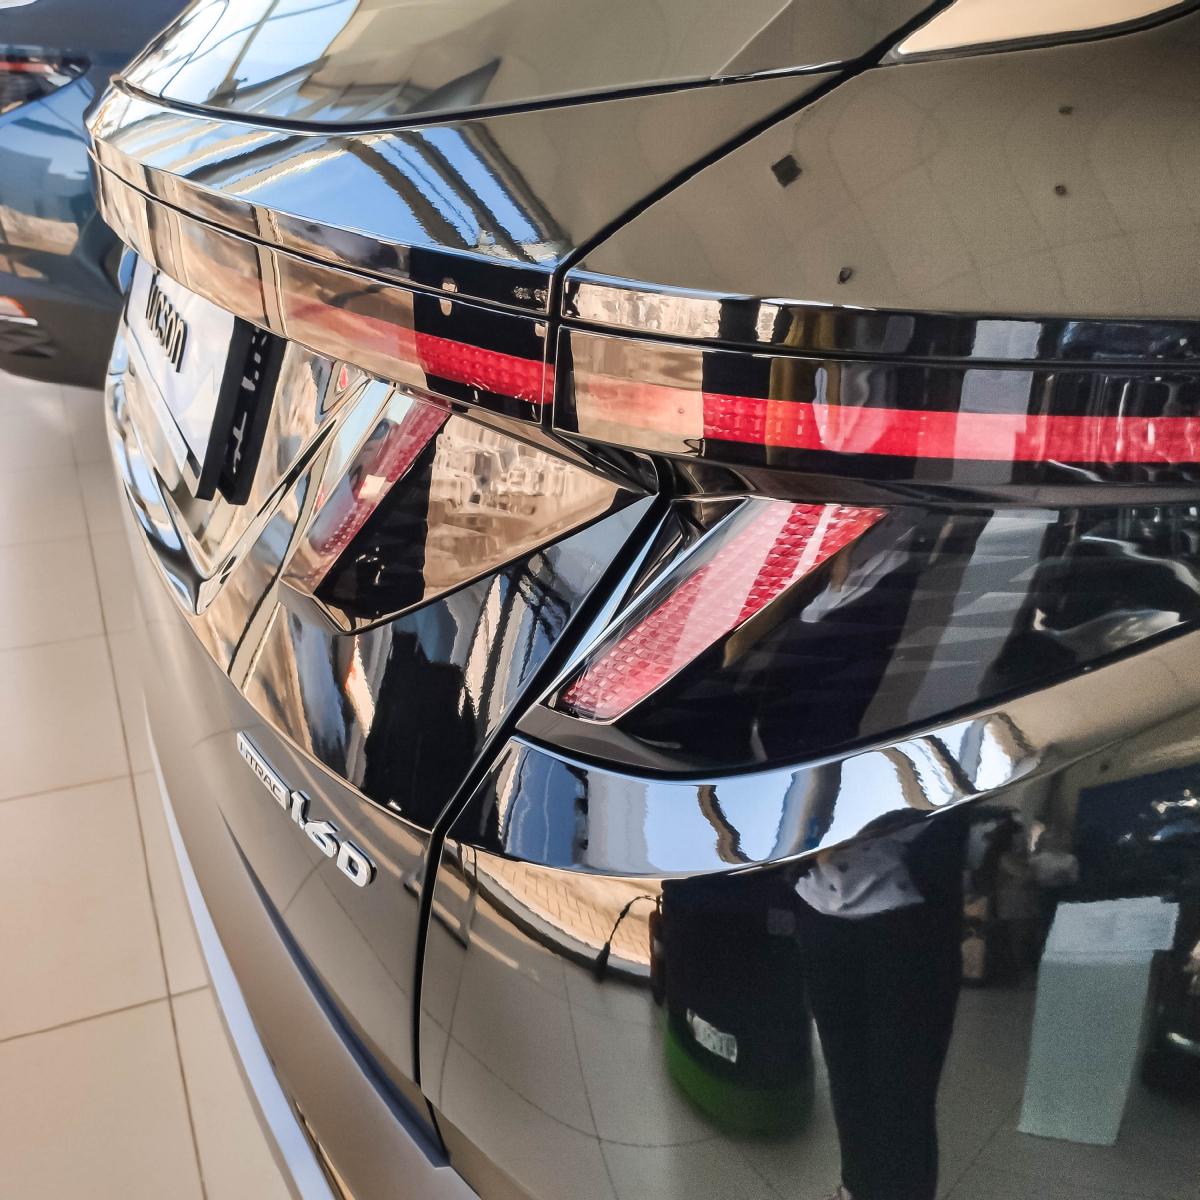 Максимально заряджений абсолютно новий Tucson! | Хюндай Мотор Україна - фото 11